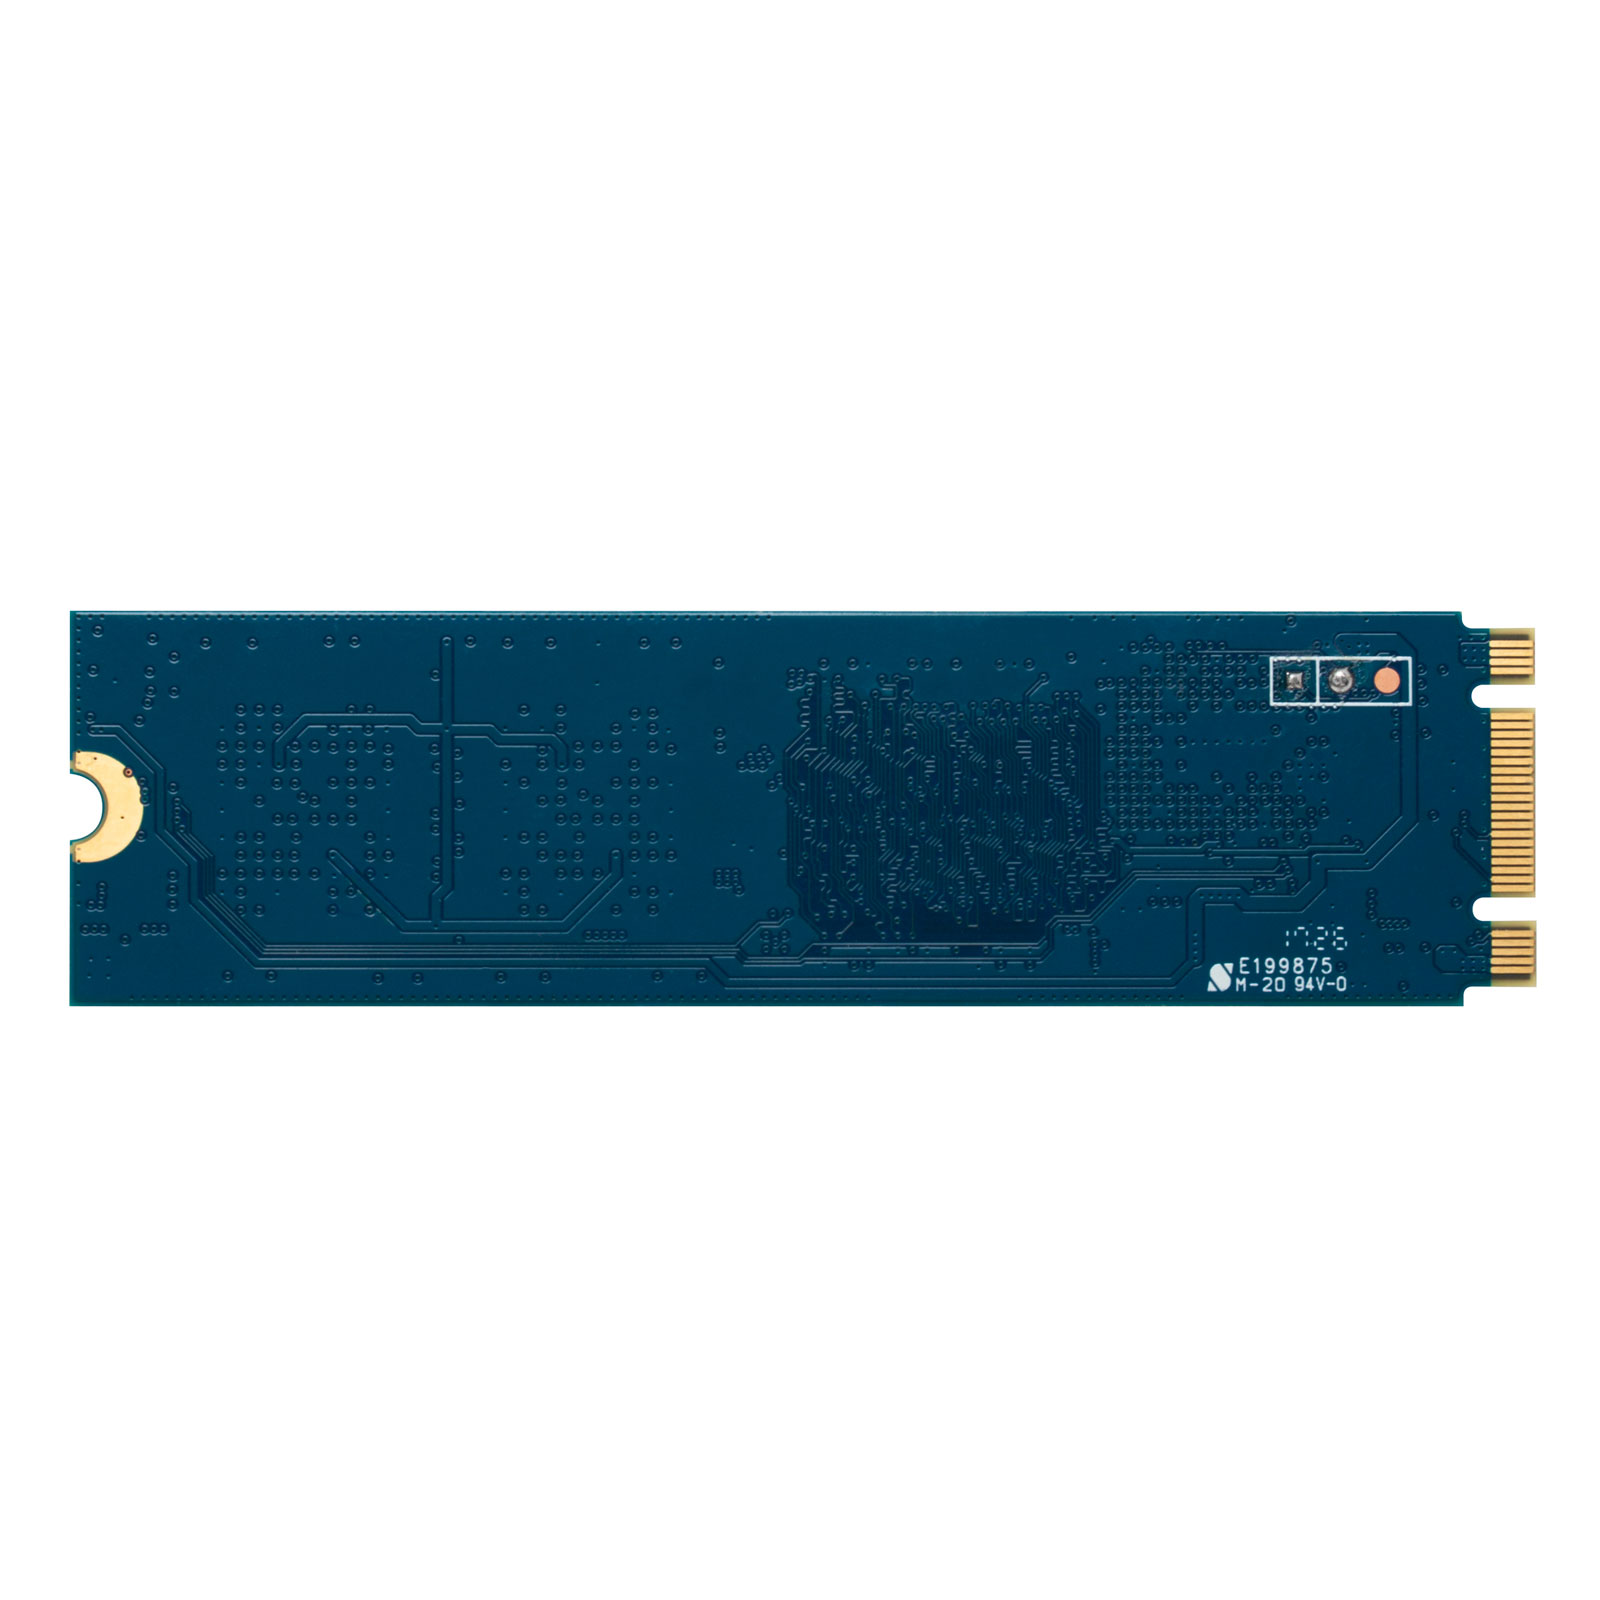 120Go SSD M.2 SUV500M8/120G (SUV500M8/120G) - Achat / Vente Disque SSD sur Picata.fr - 1